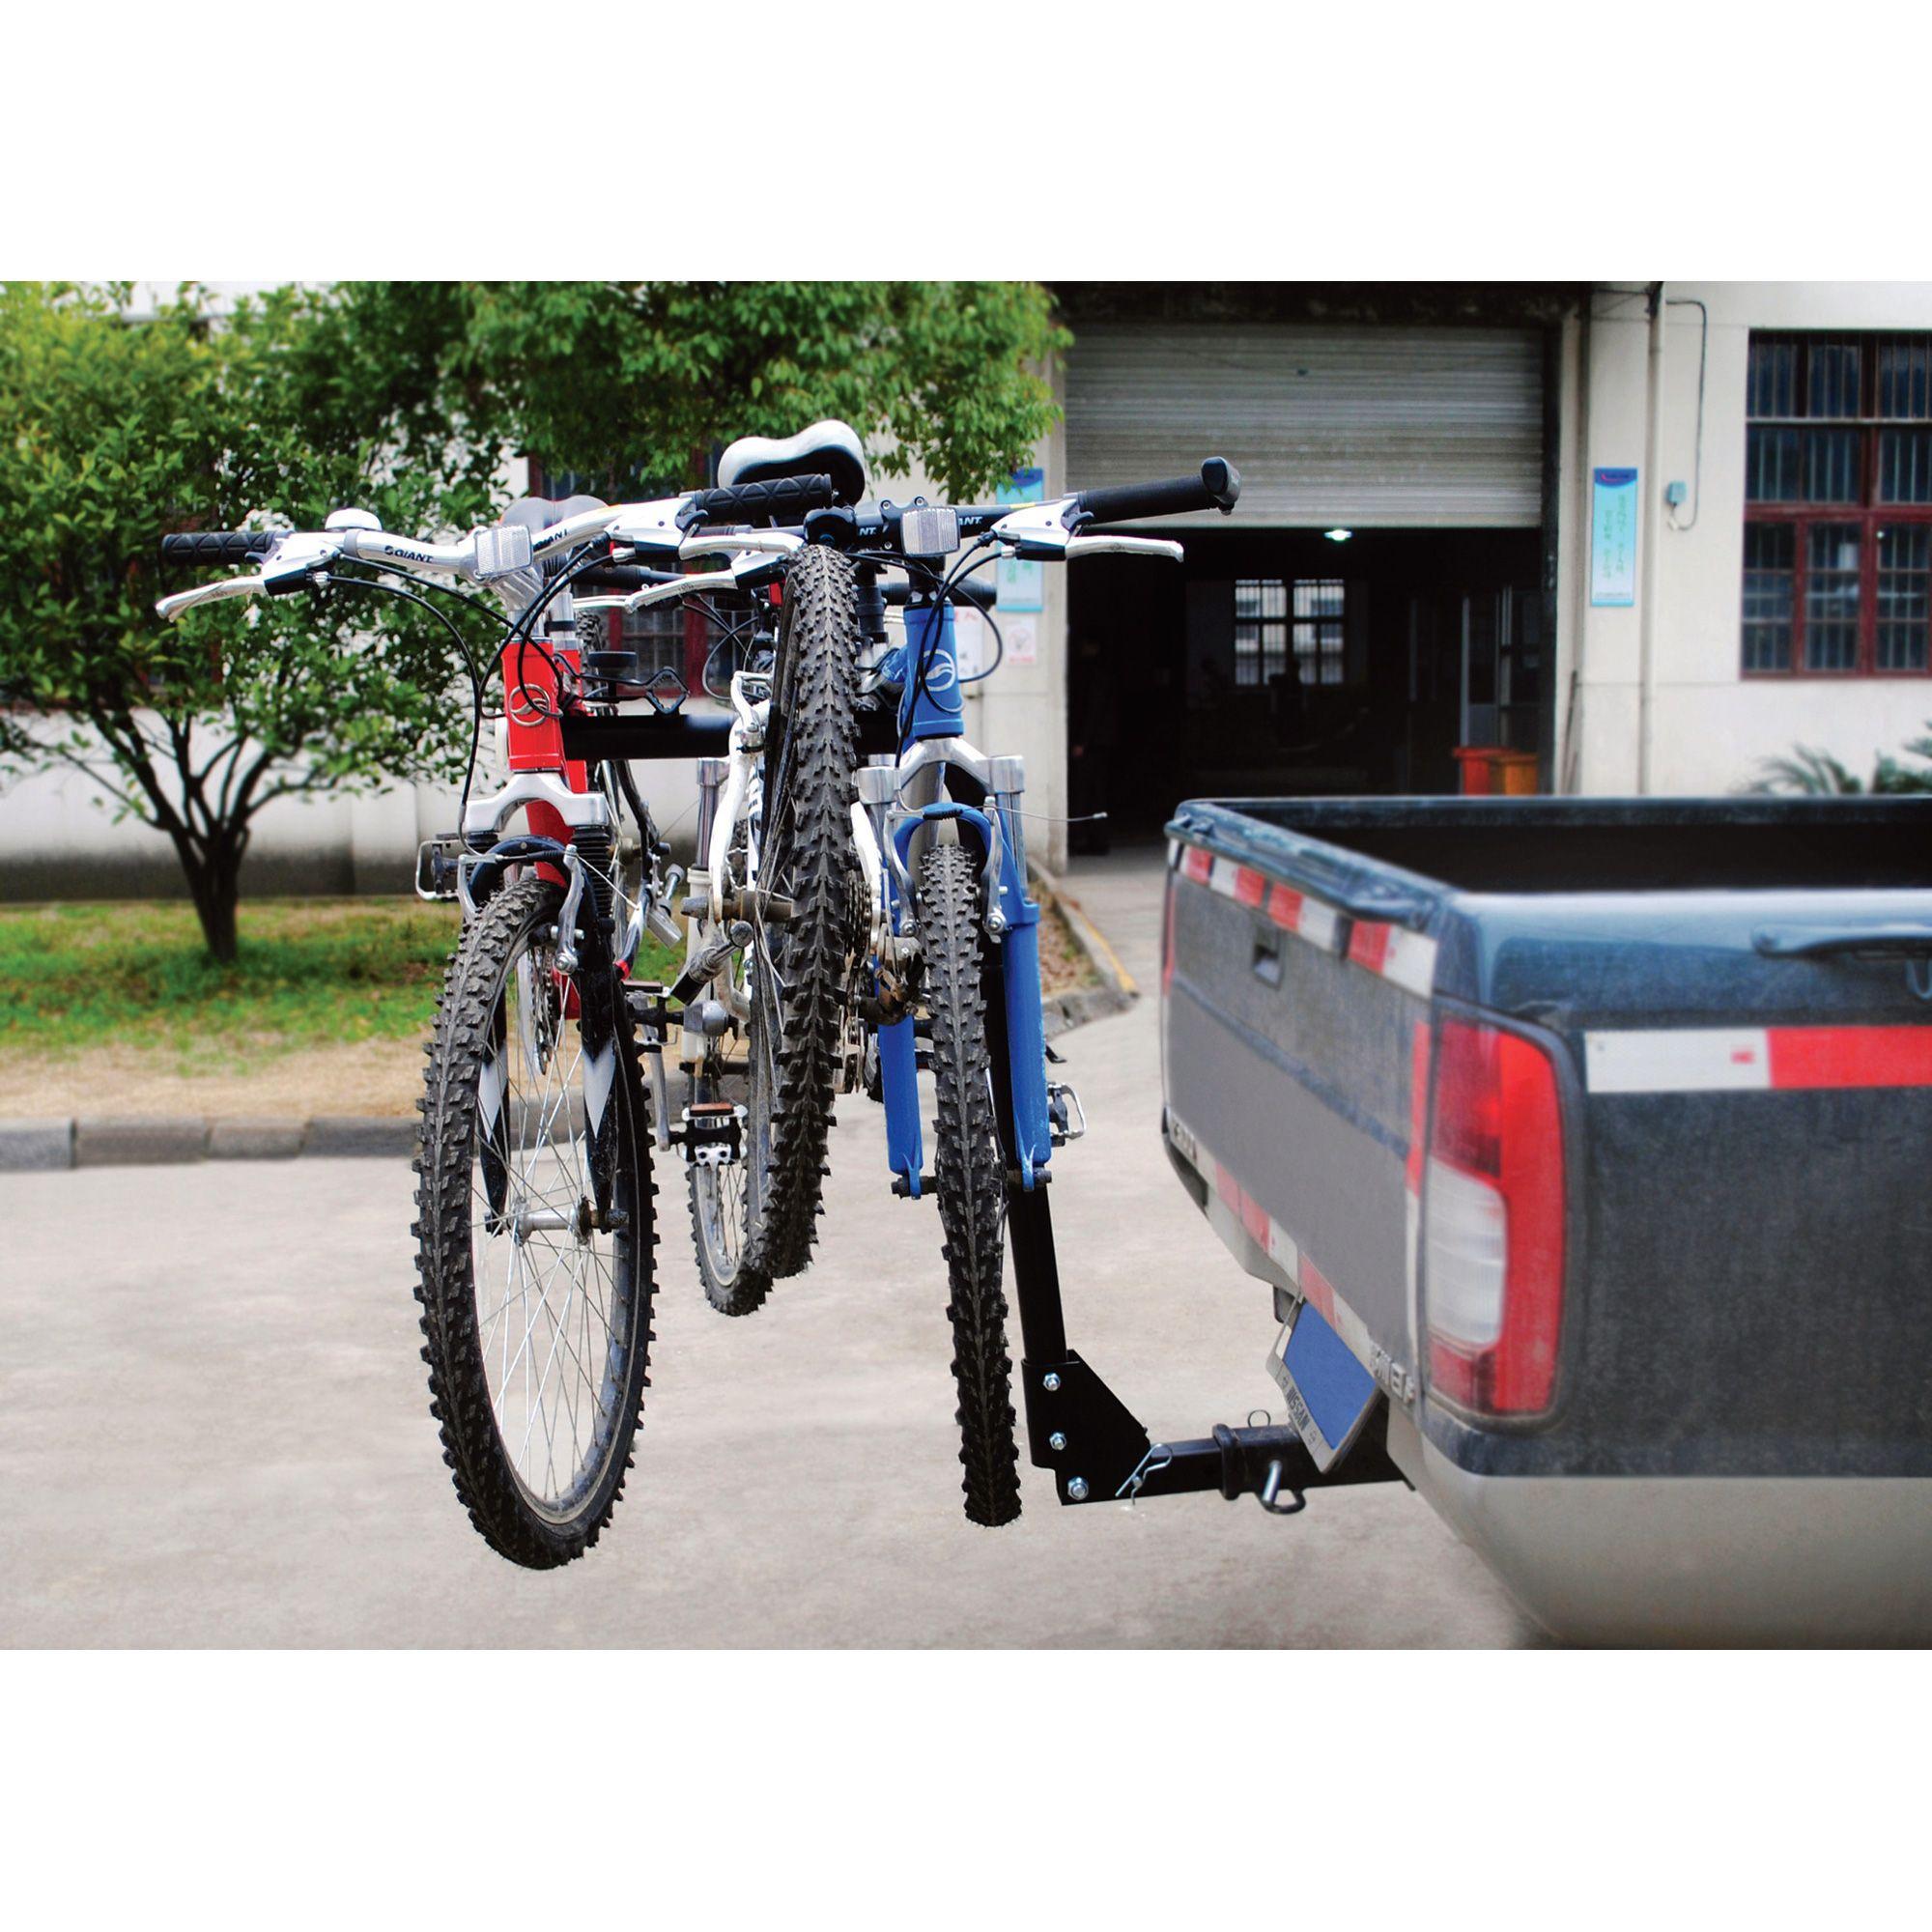 bike hitch yakima com rack fullswing spex outdoorplay